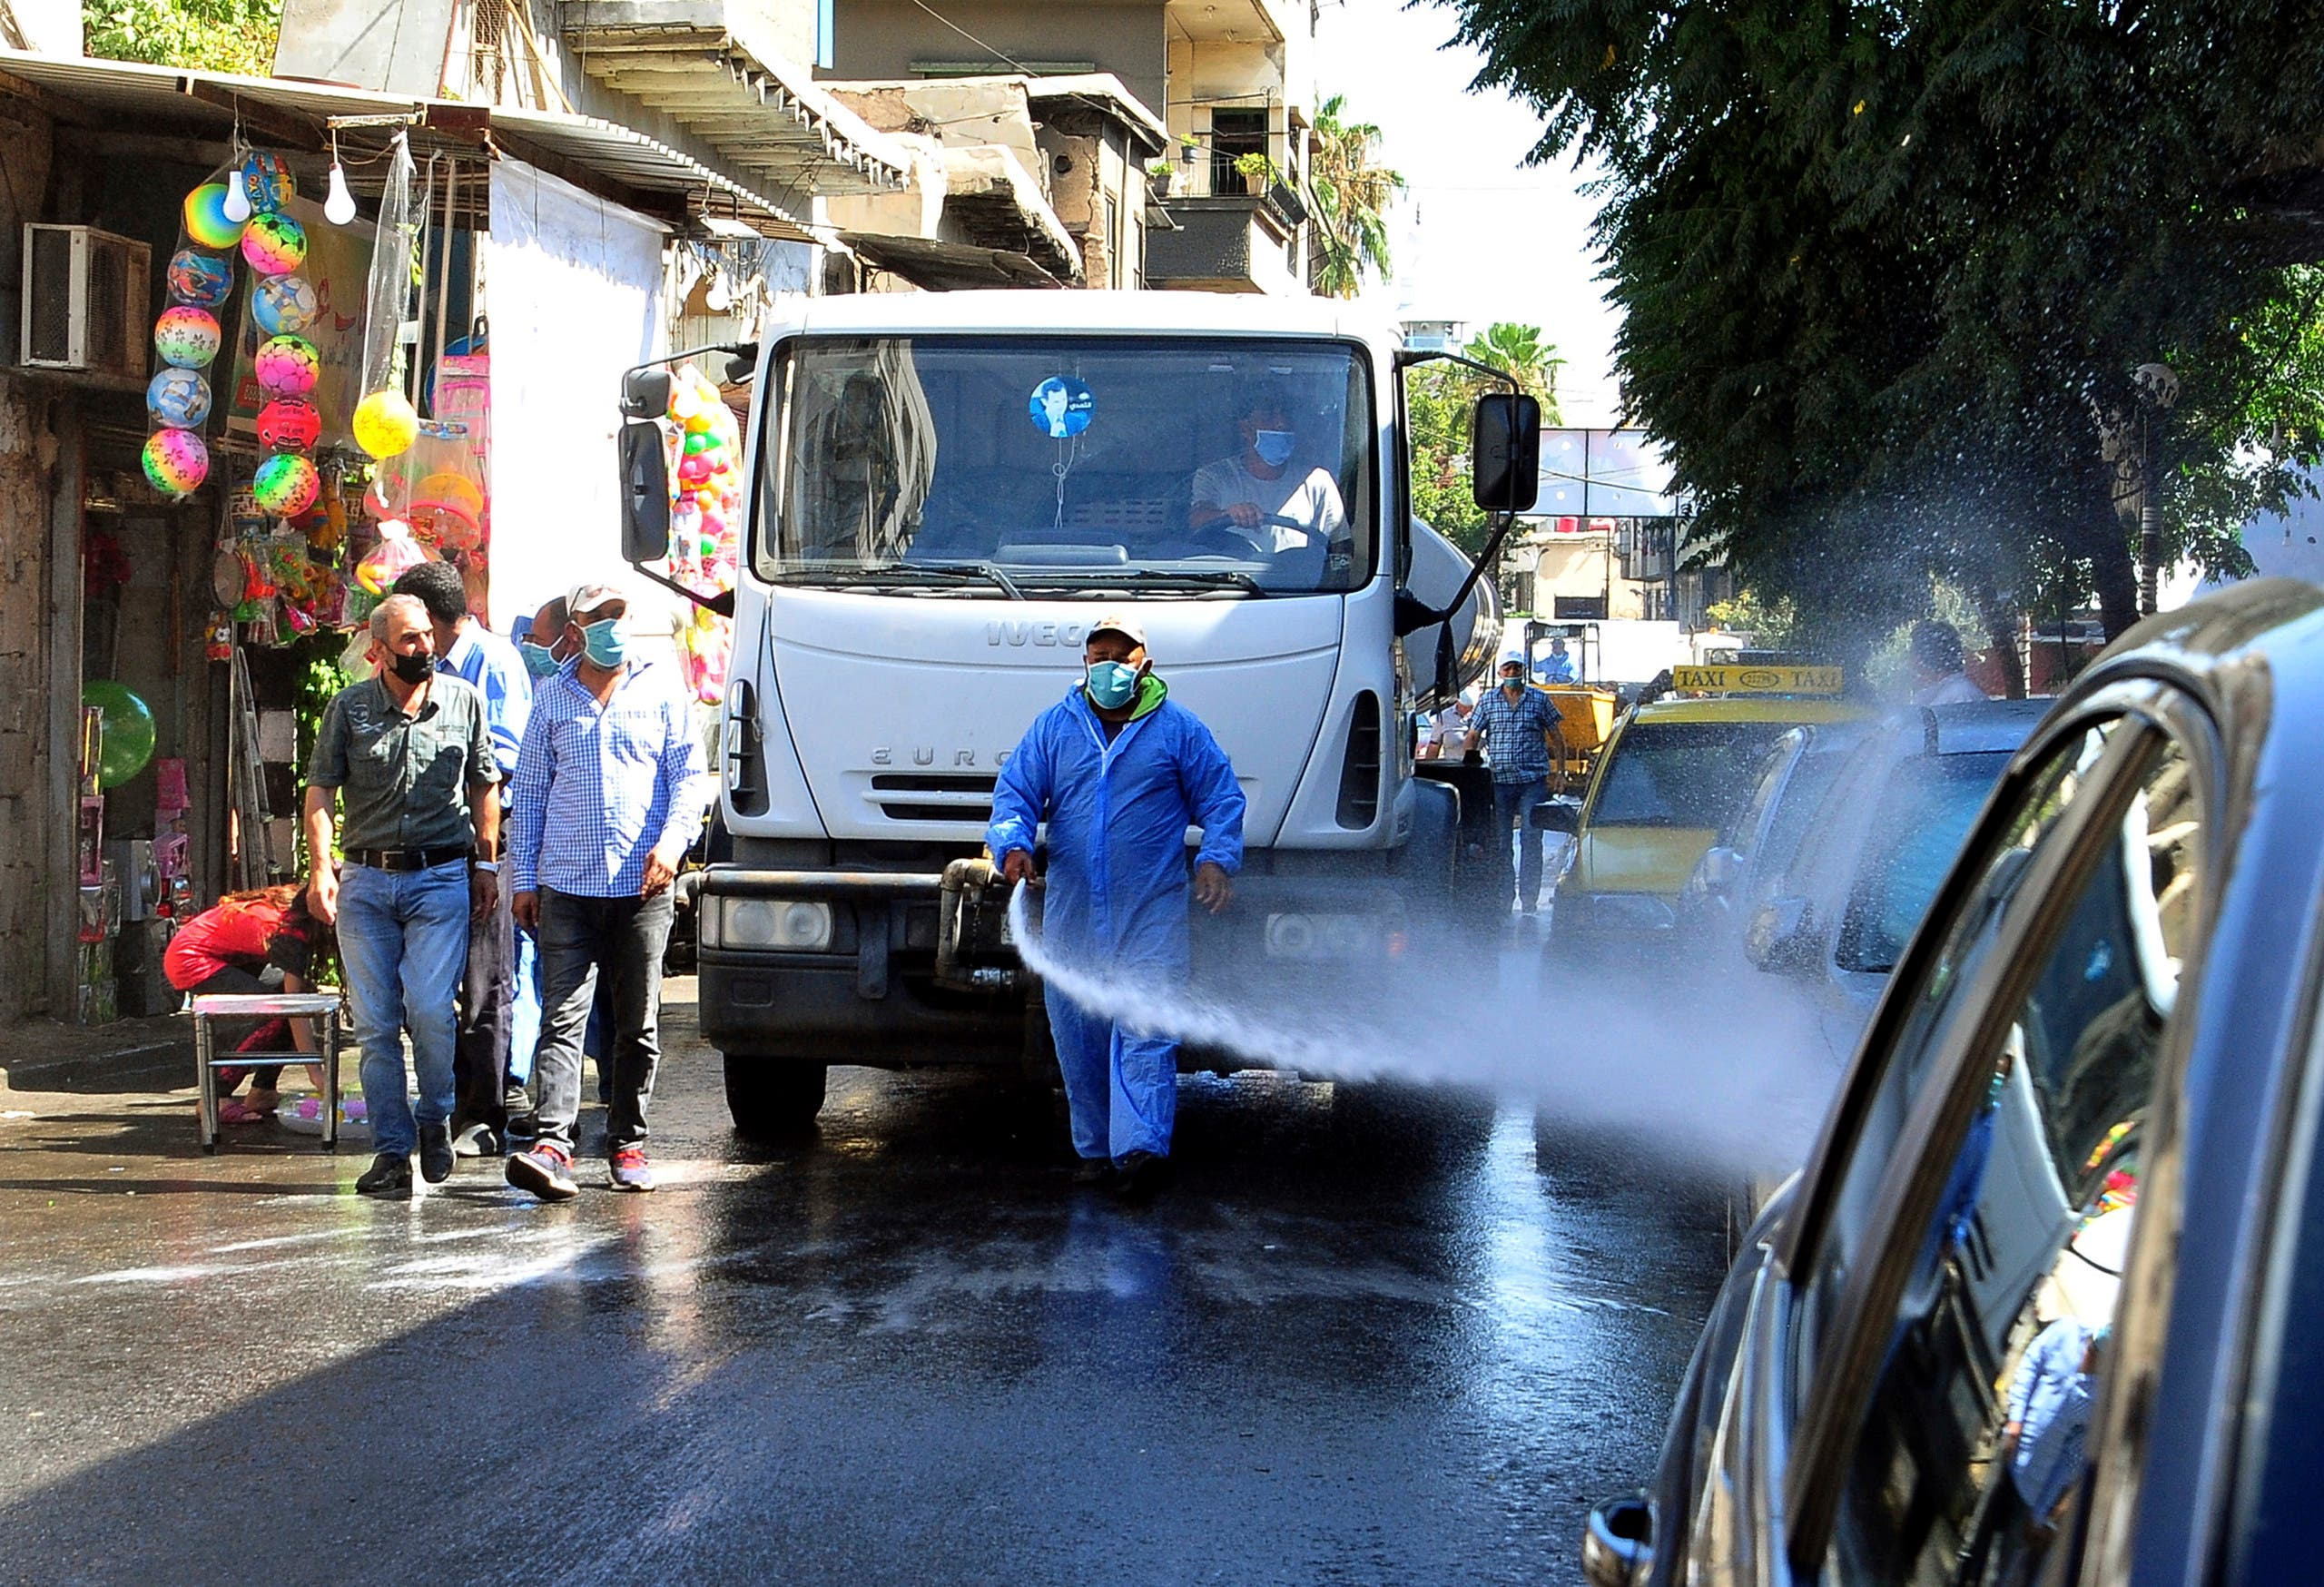 من دمشق - اسوشيتد برس